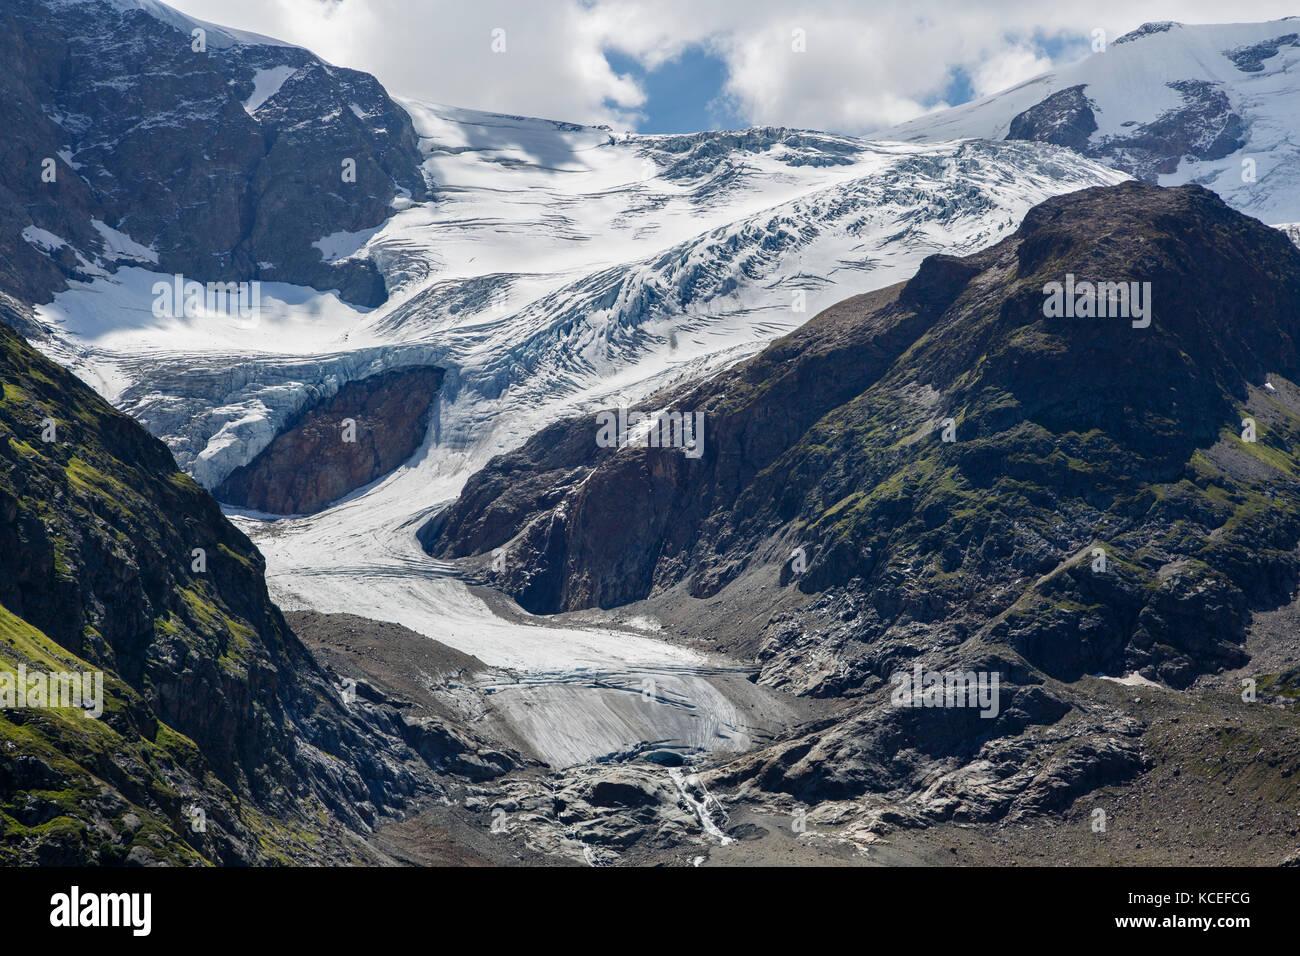 The Stein Glacier seen from the Susten Pass, Switzerland - Stock Image